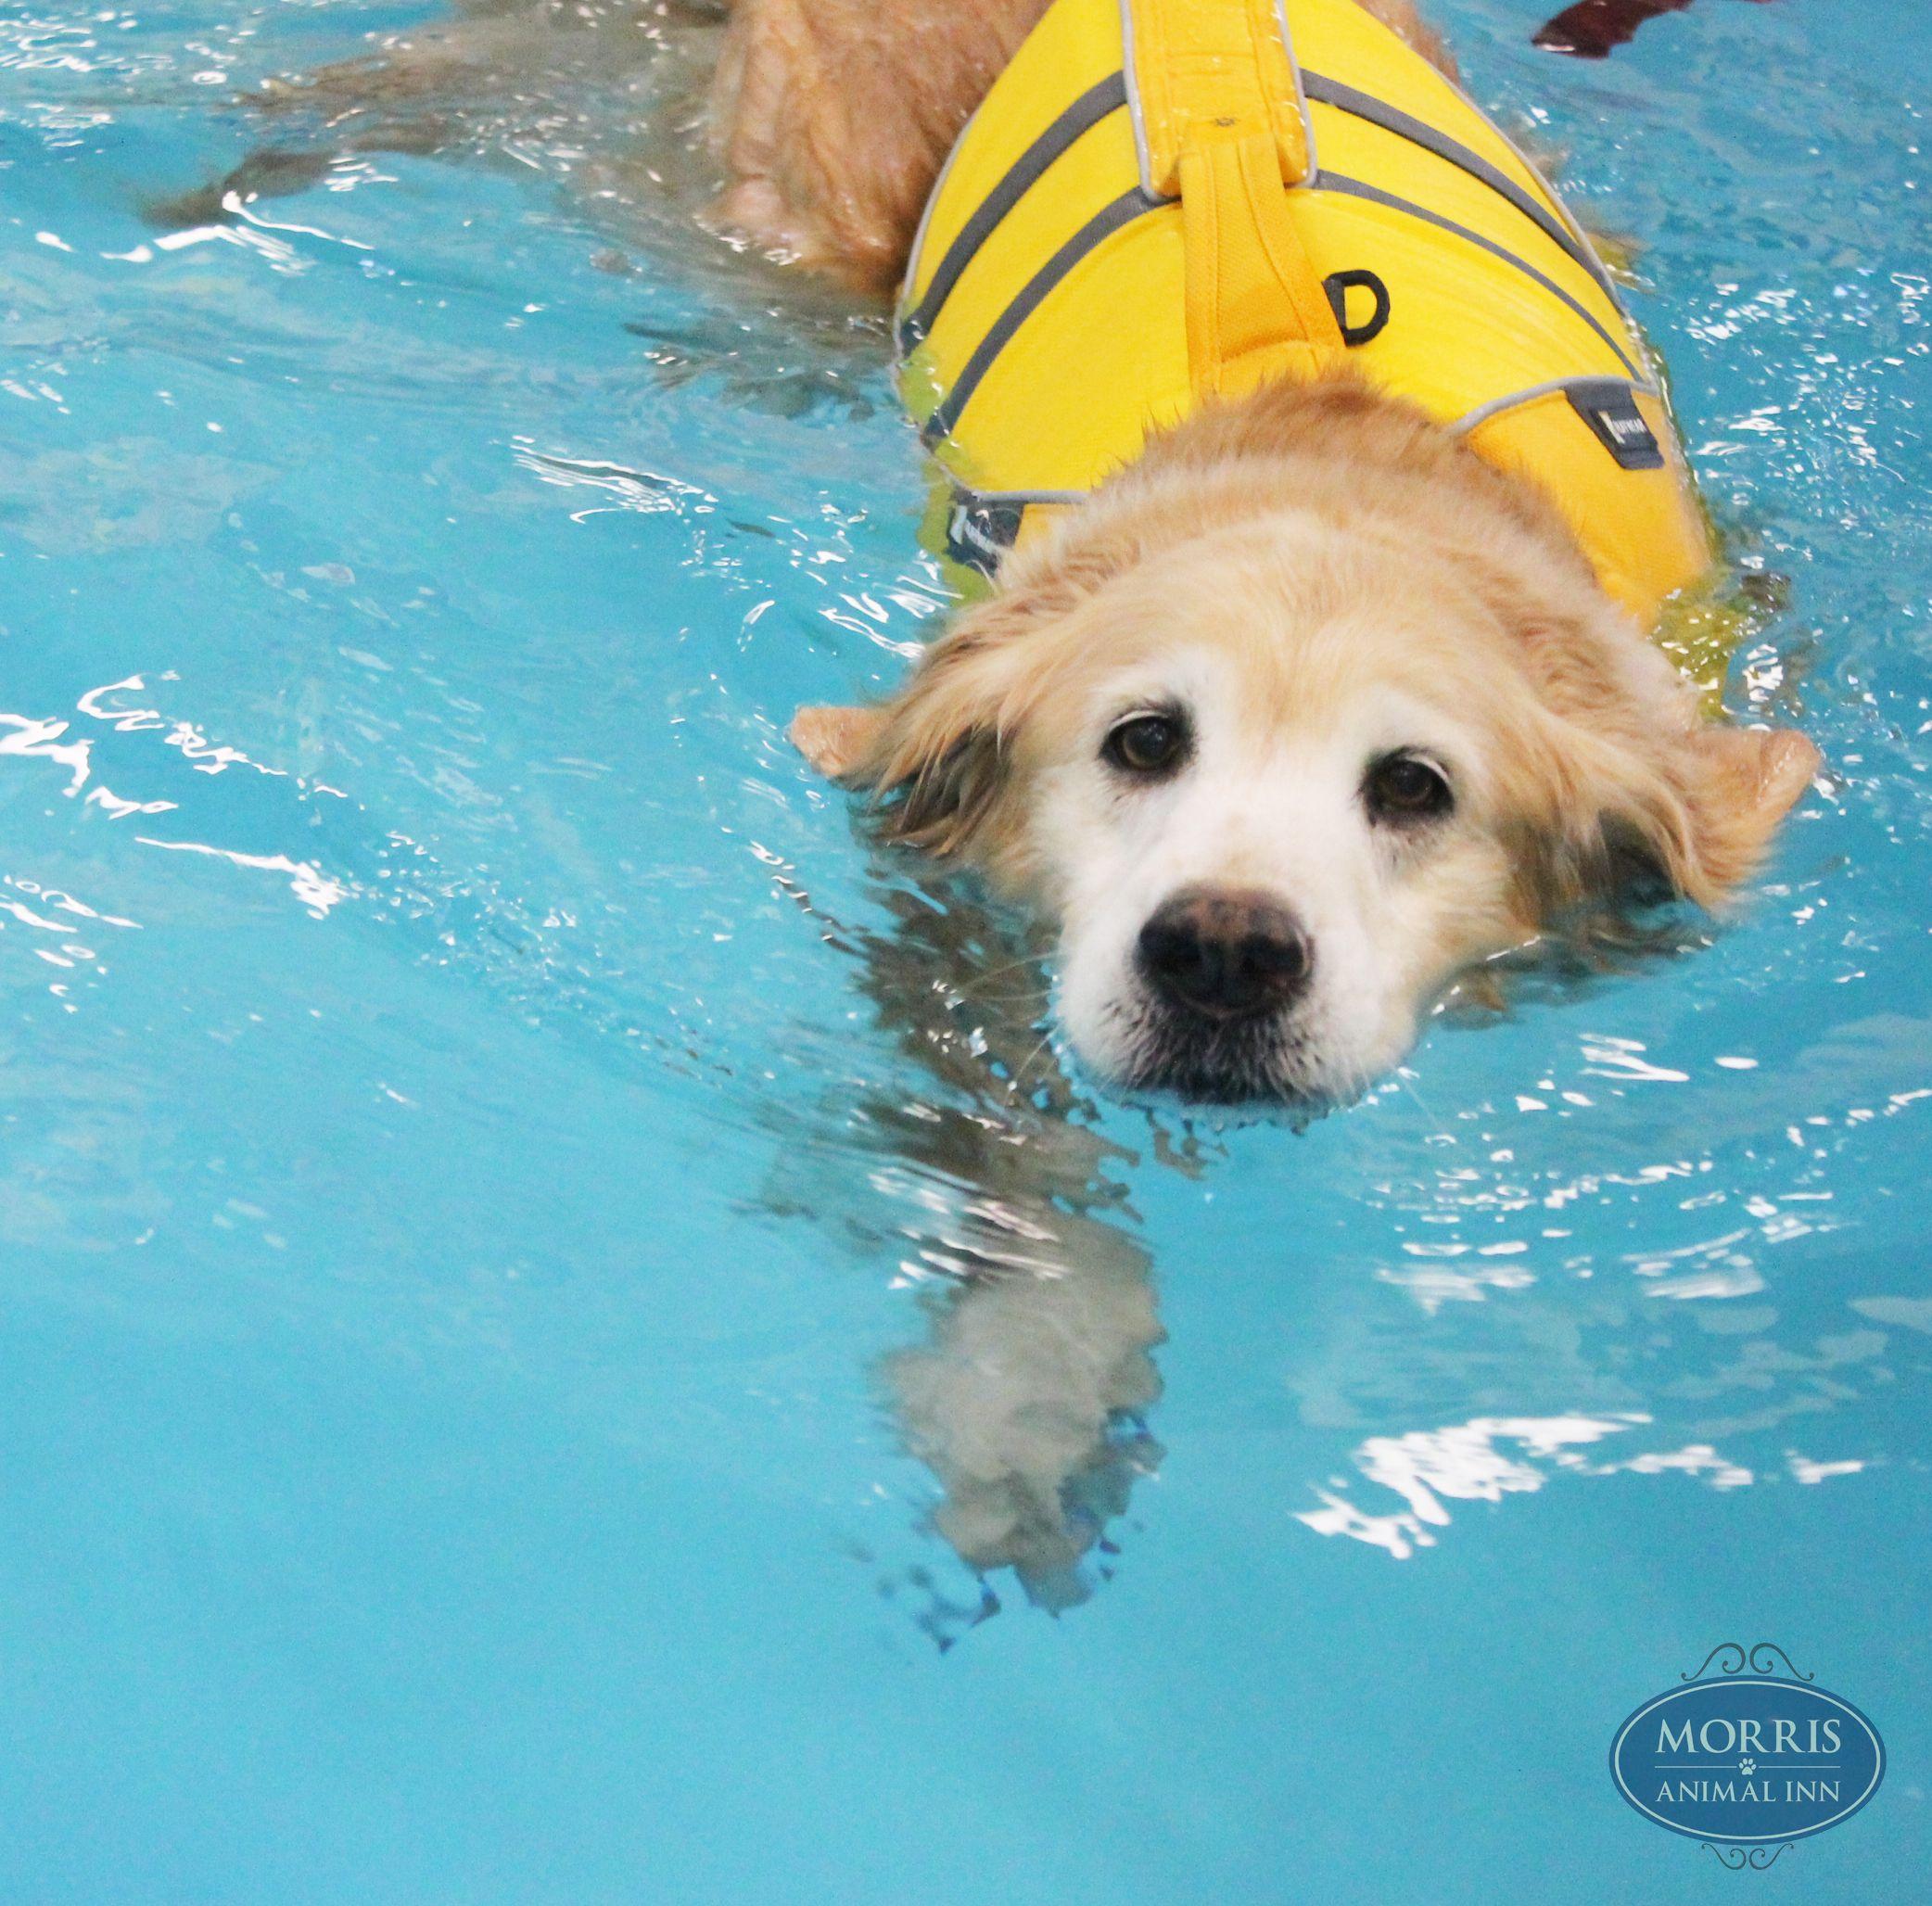 10 Year Old Golden Retriever Madison Loves To Swim In Our Indoor Pool Old Golden Retriever Golden Retriever Retriever